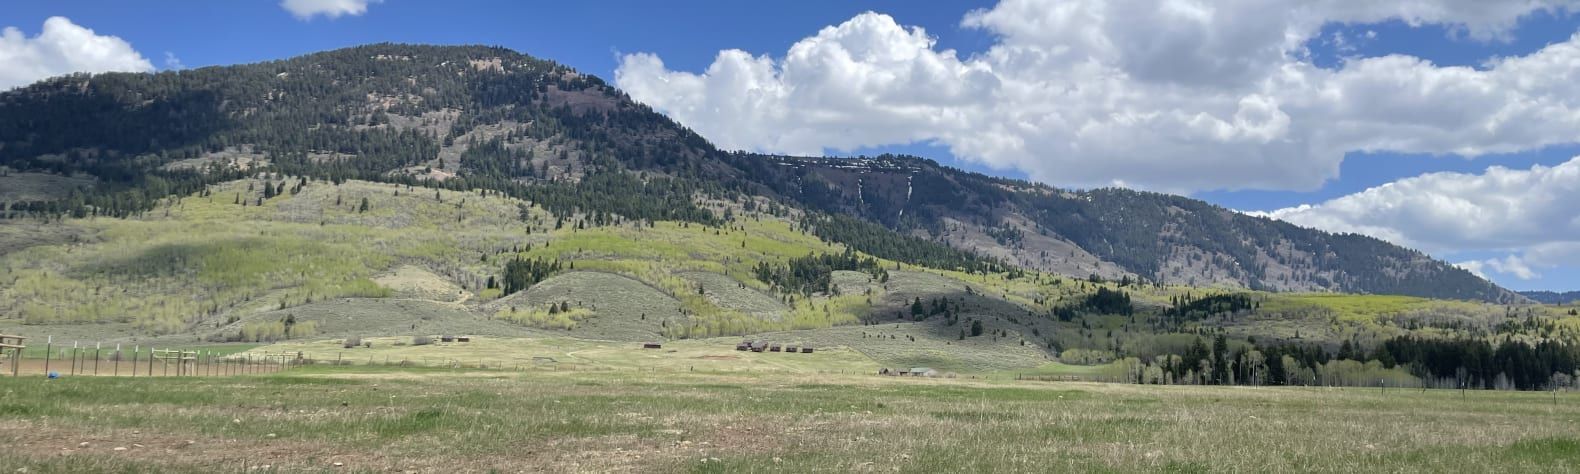 Smoot Bucking B Ranch